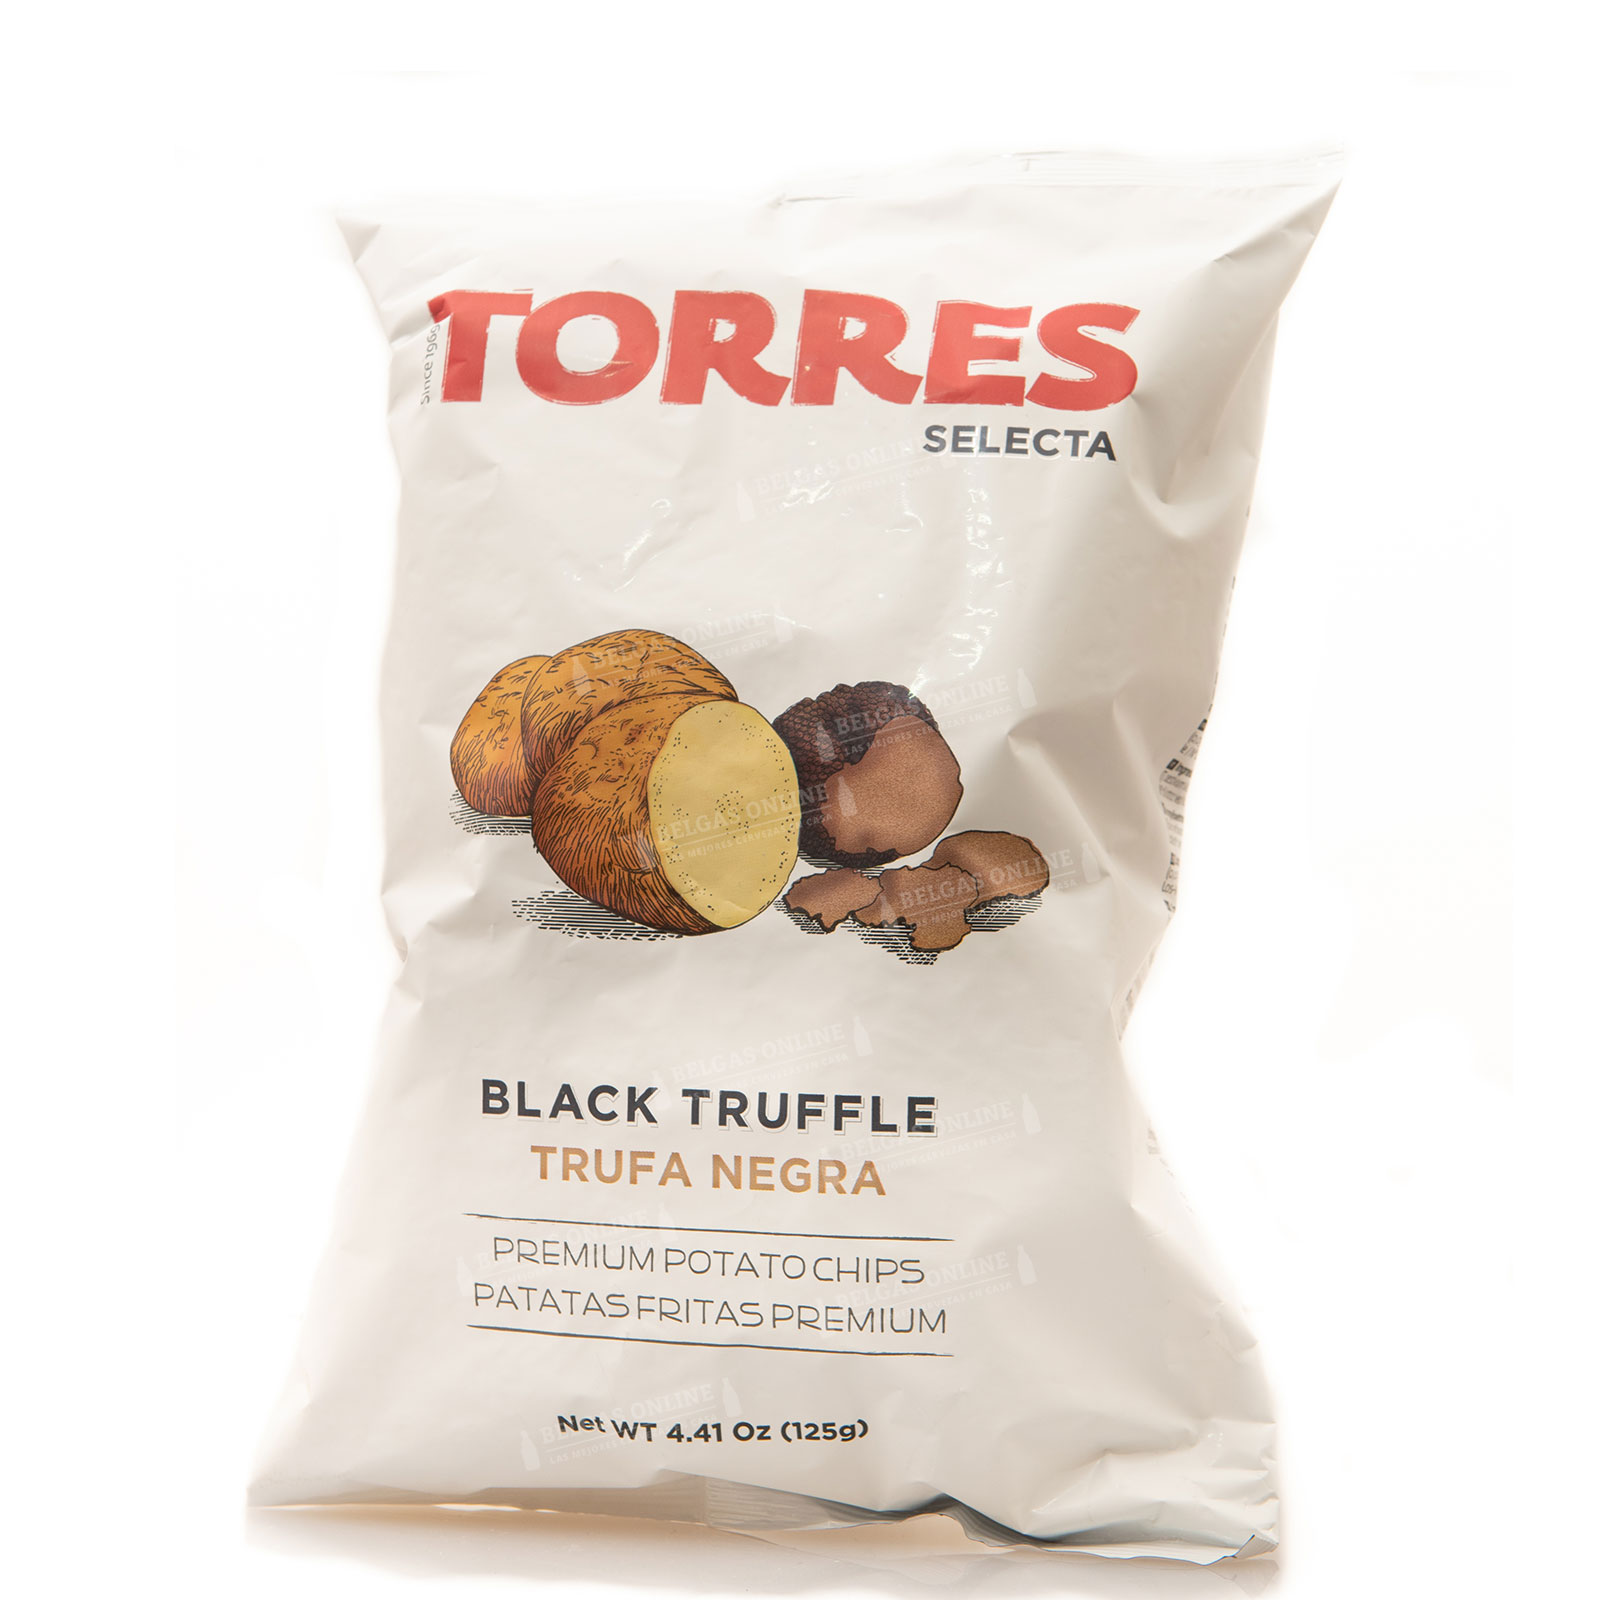 Torres Trufa